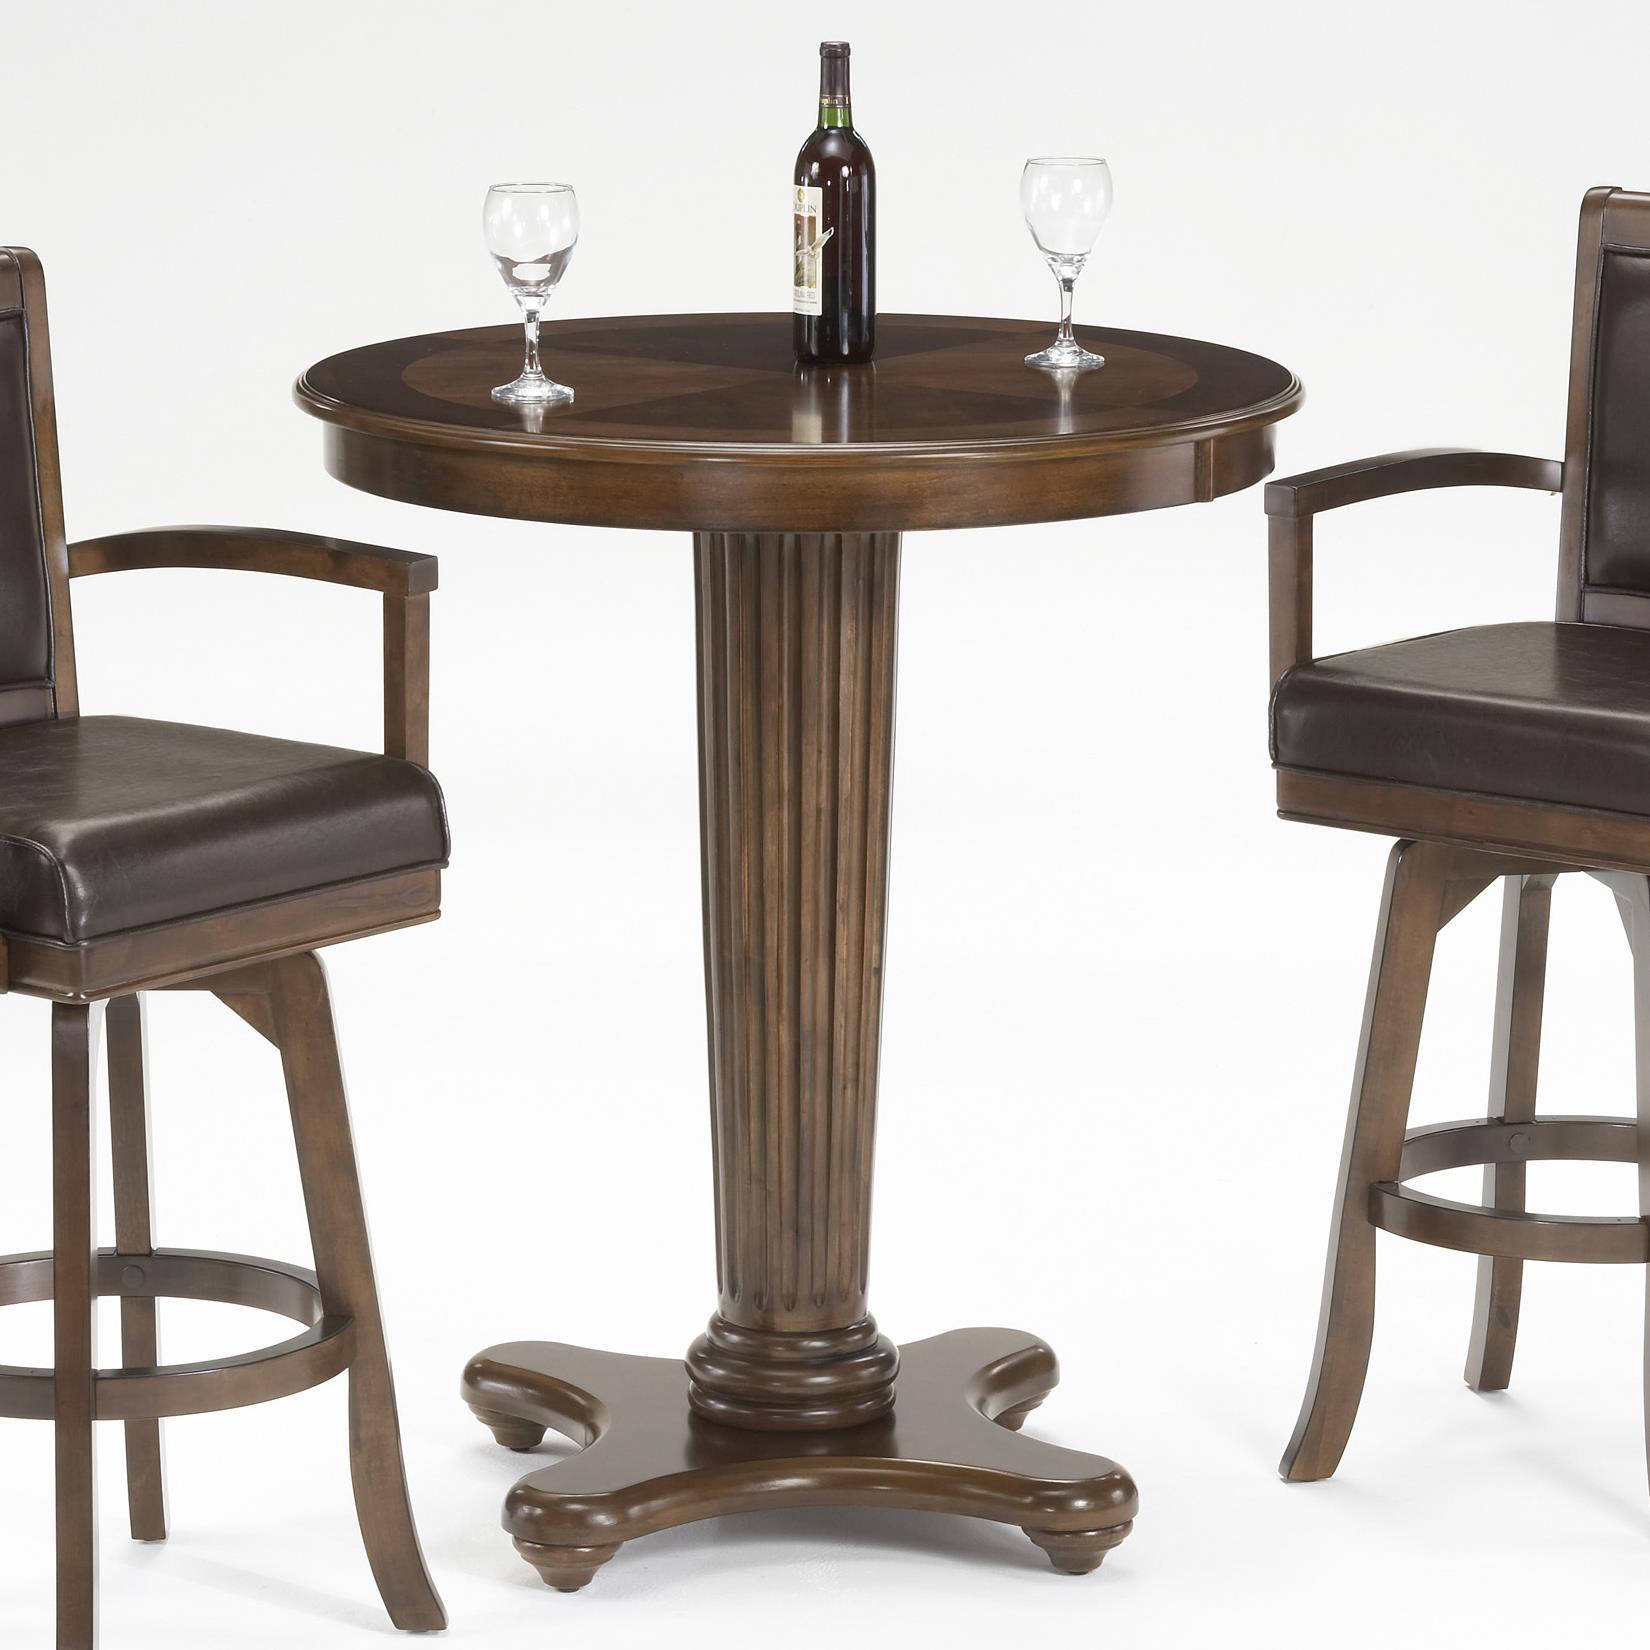 Ambassador Bar Height Table at Ruby Gordon Home